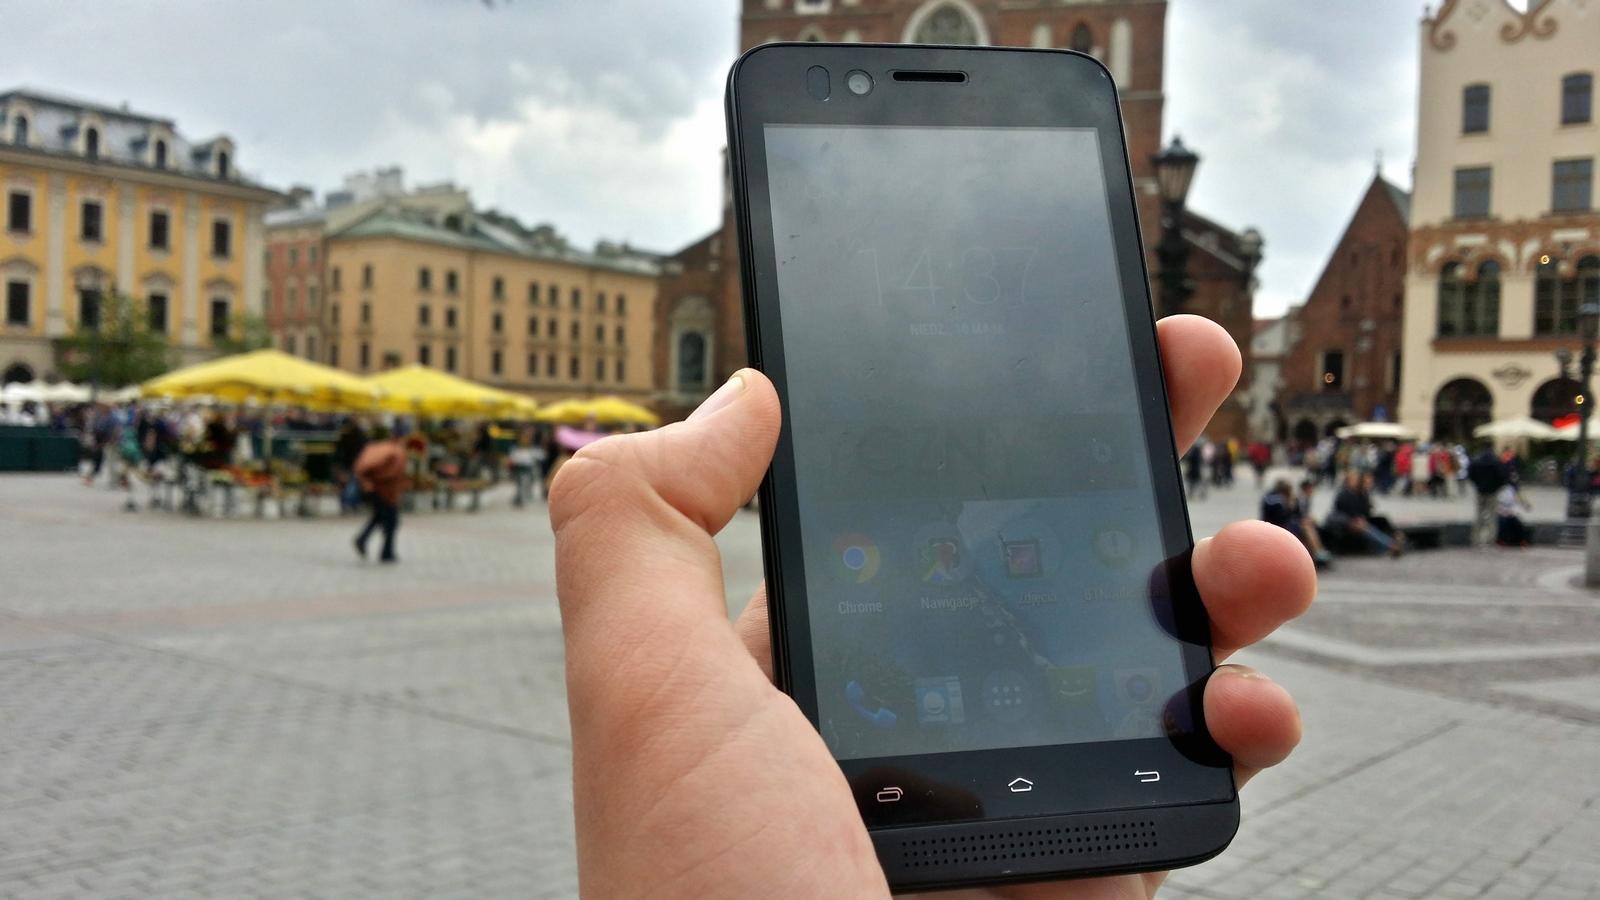 Goclever Quantum 450 LTE / fot. galaktyczny.pl